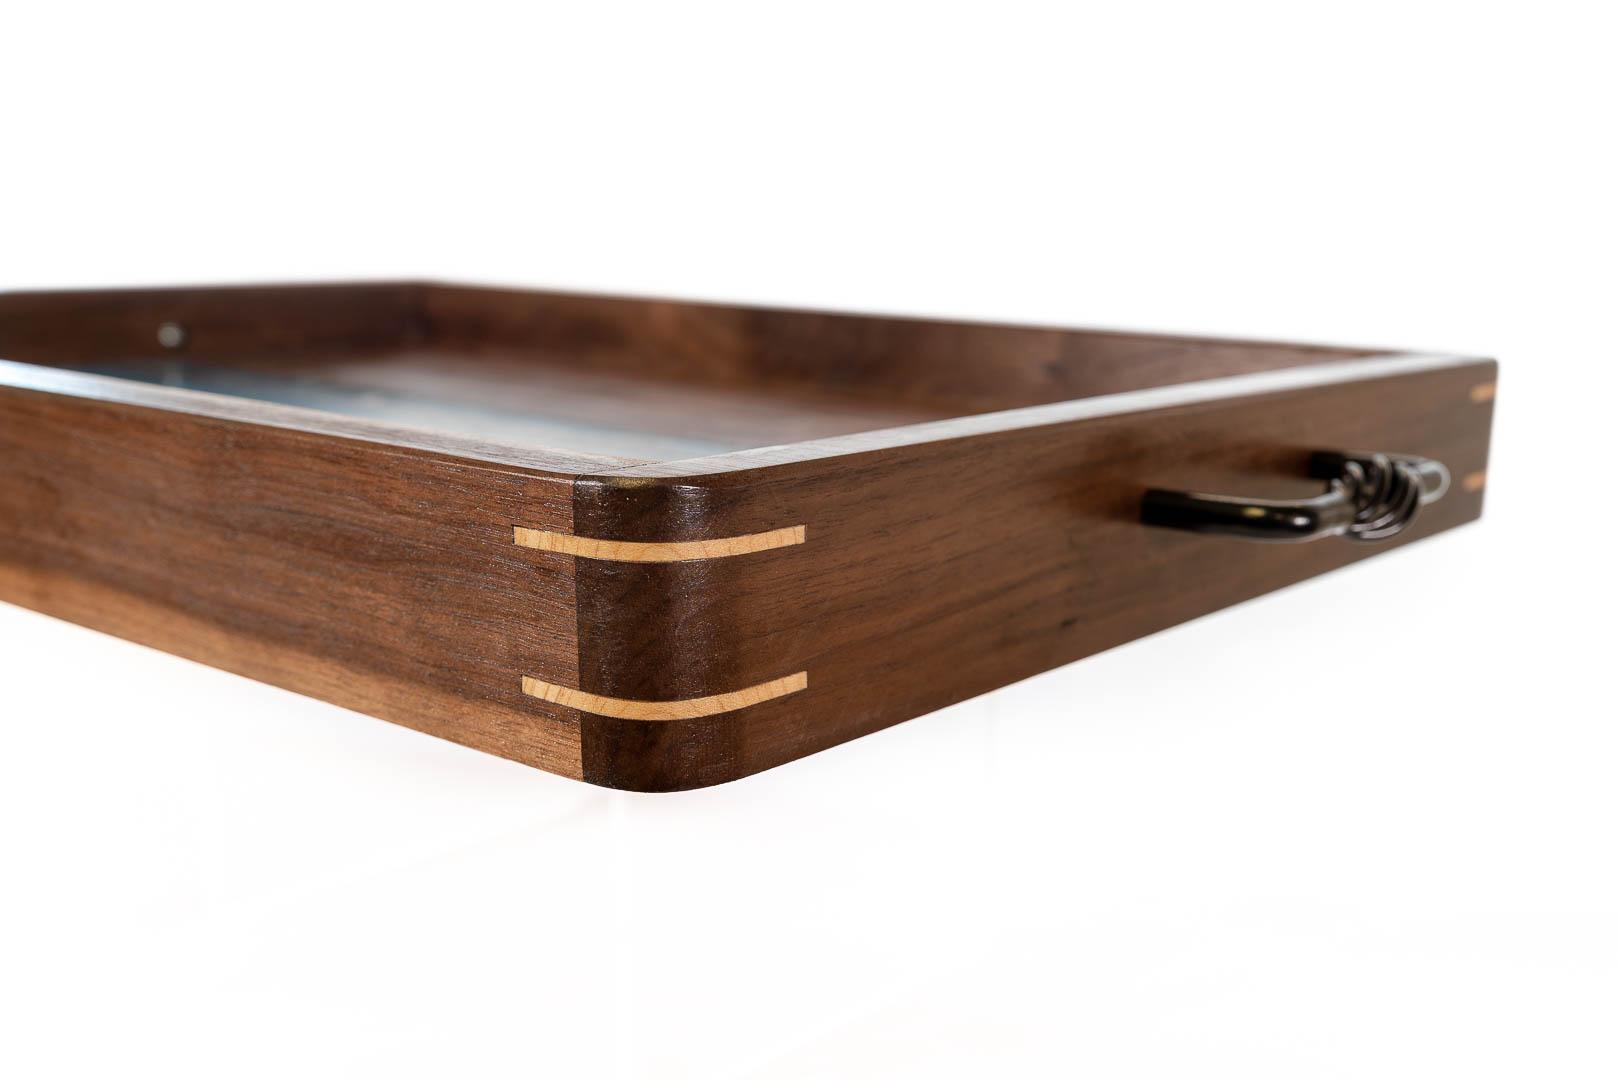 RJC Wood Creations - Serving Tray Blue Resin (2).jpg